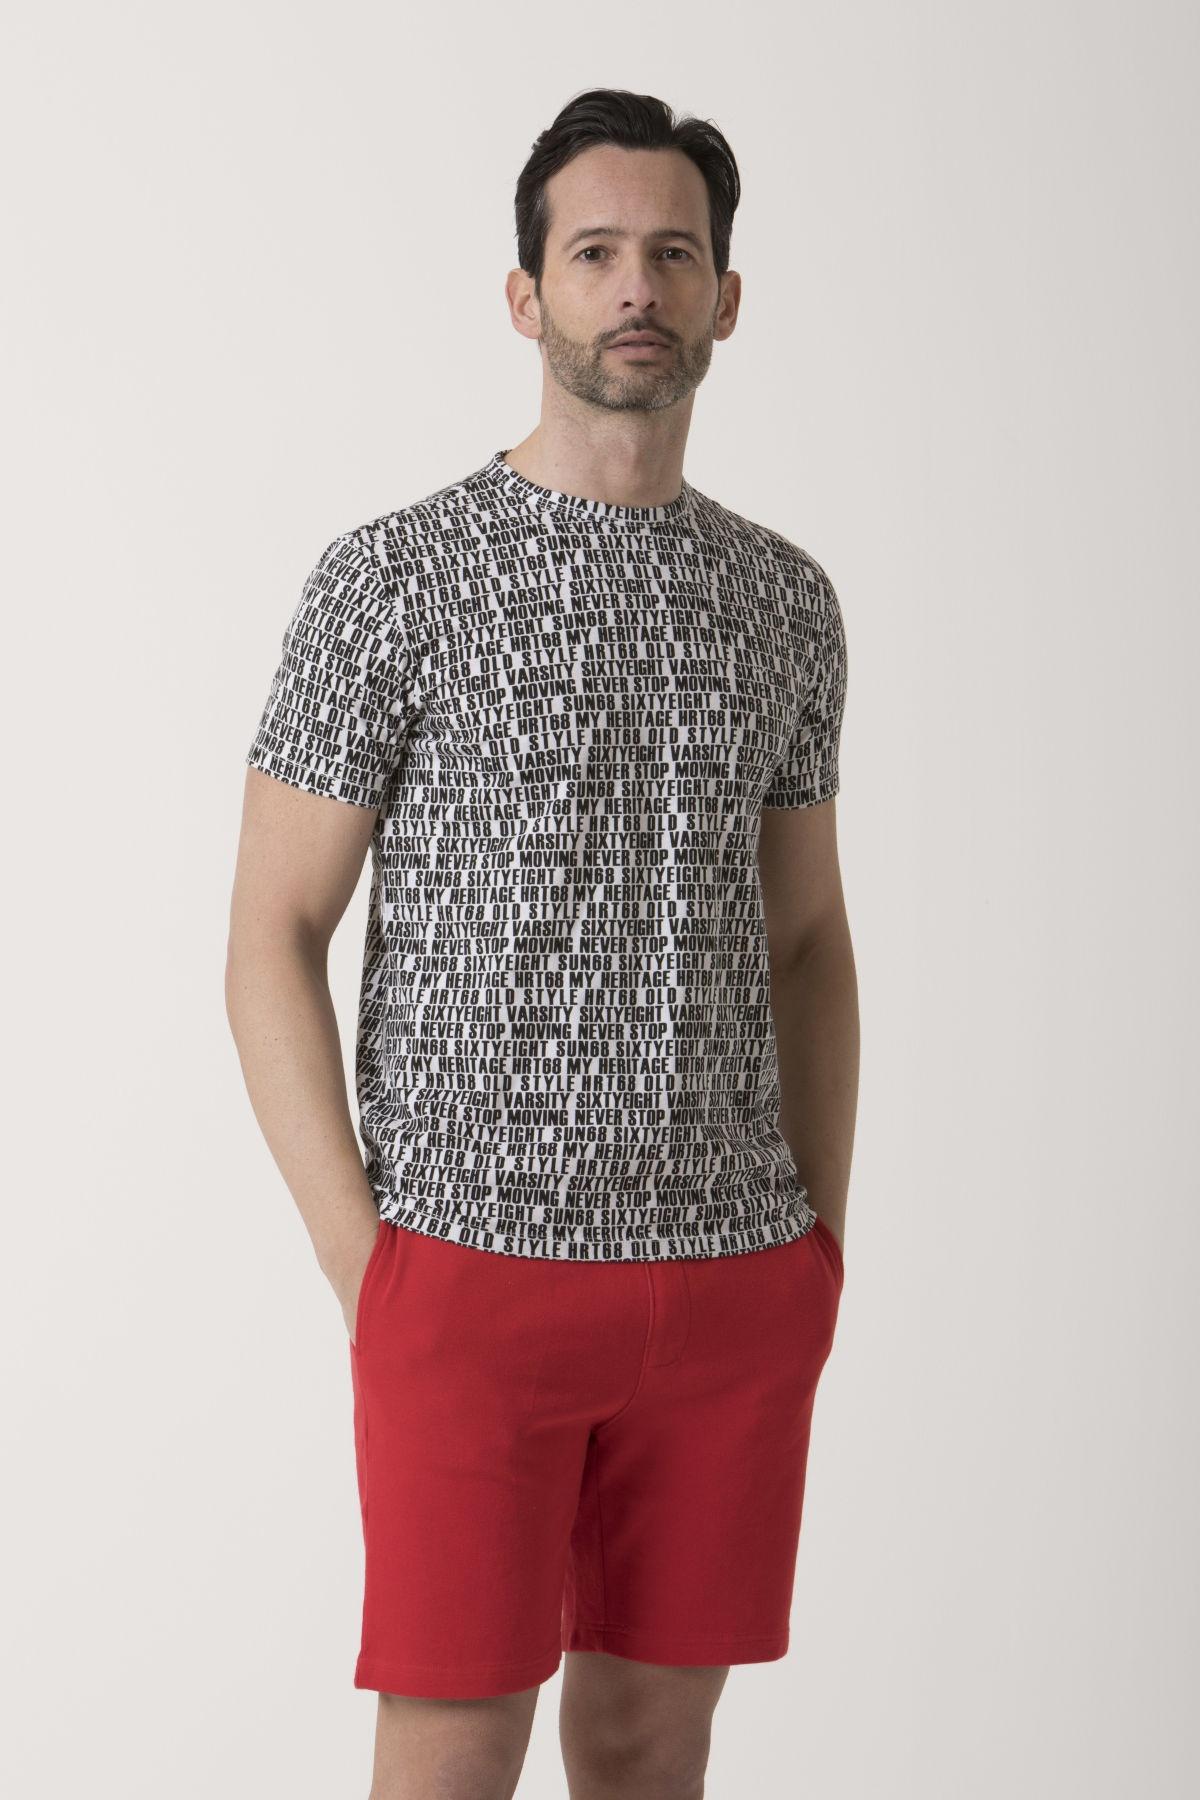 T-shirt for man SUN68 S/S 19